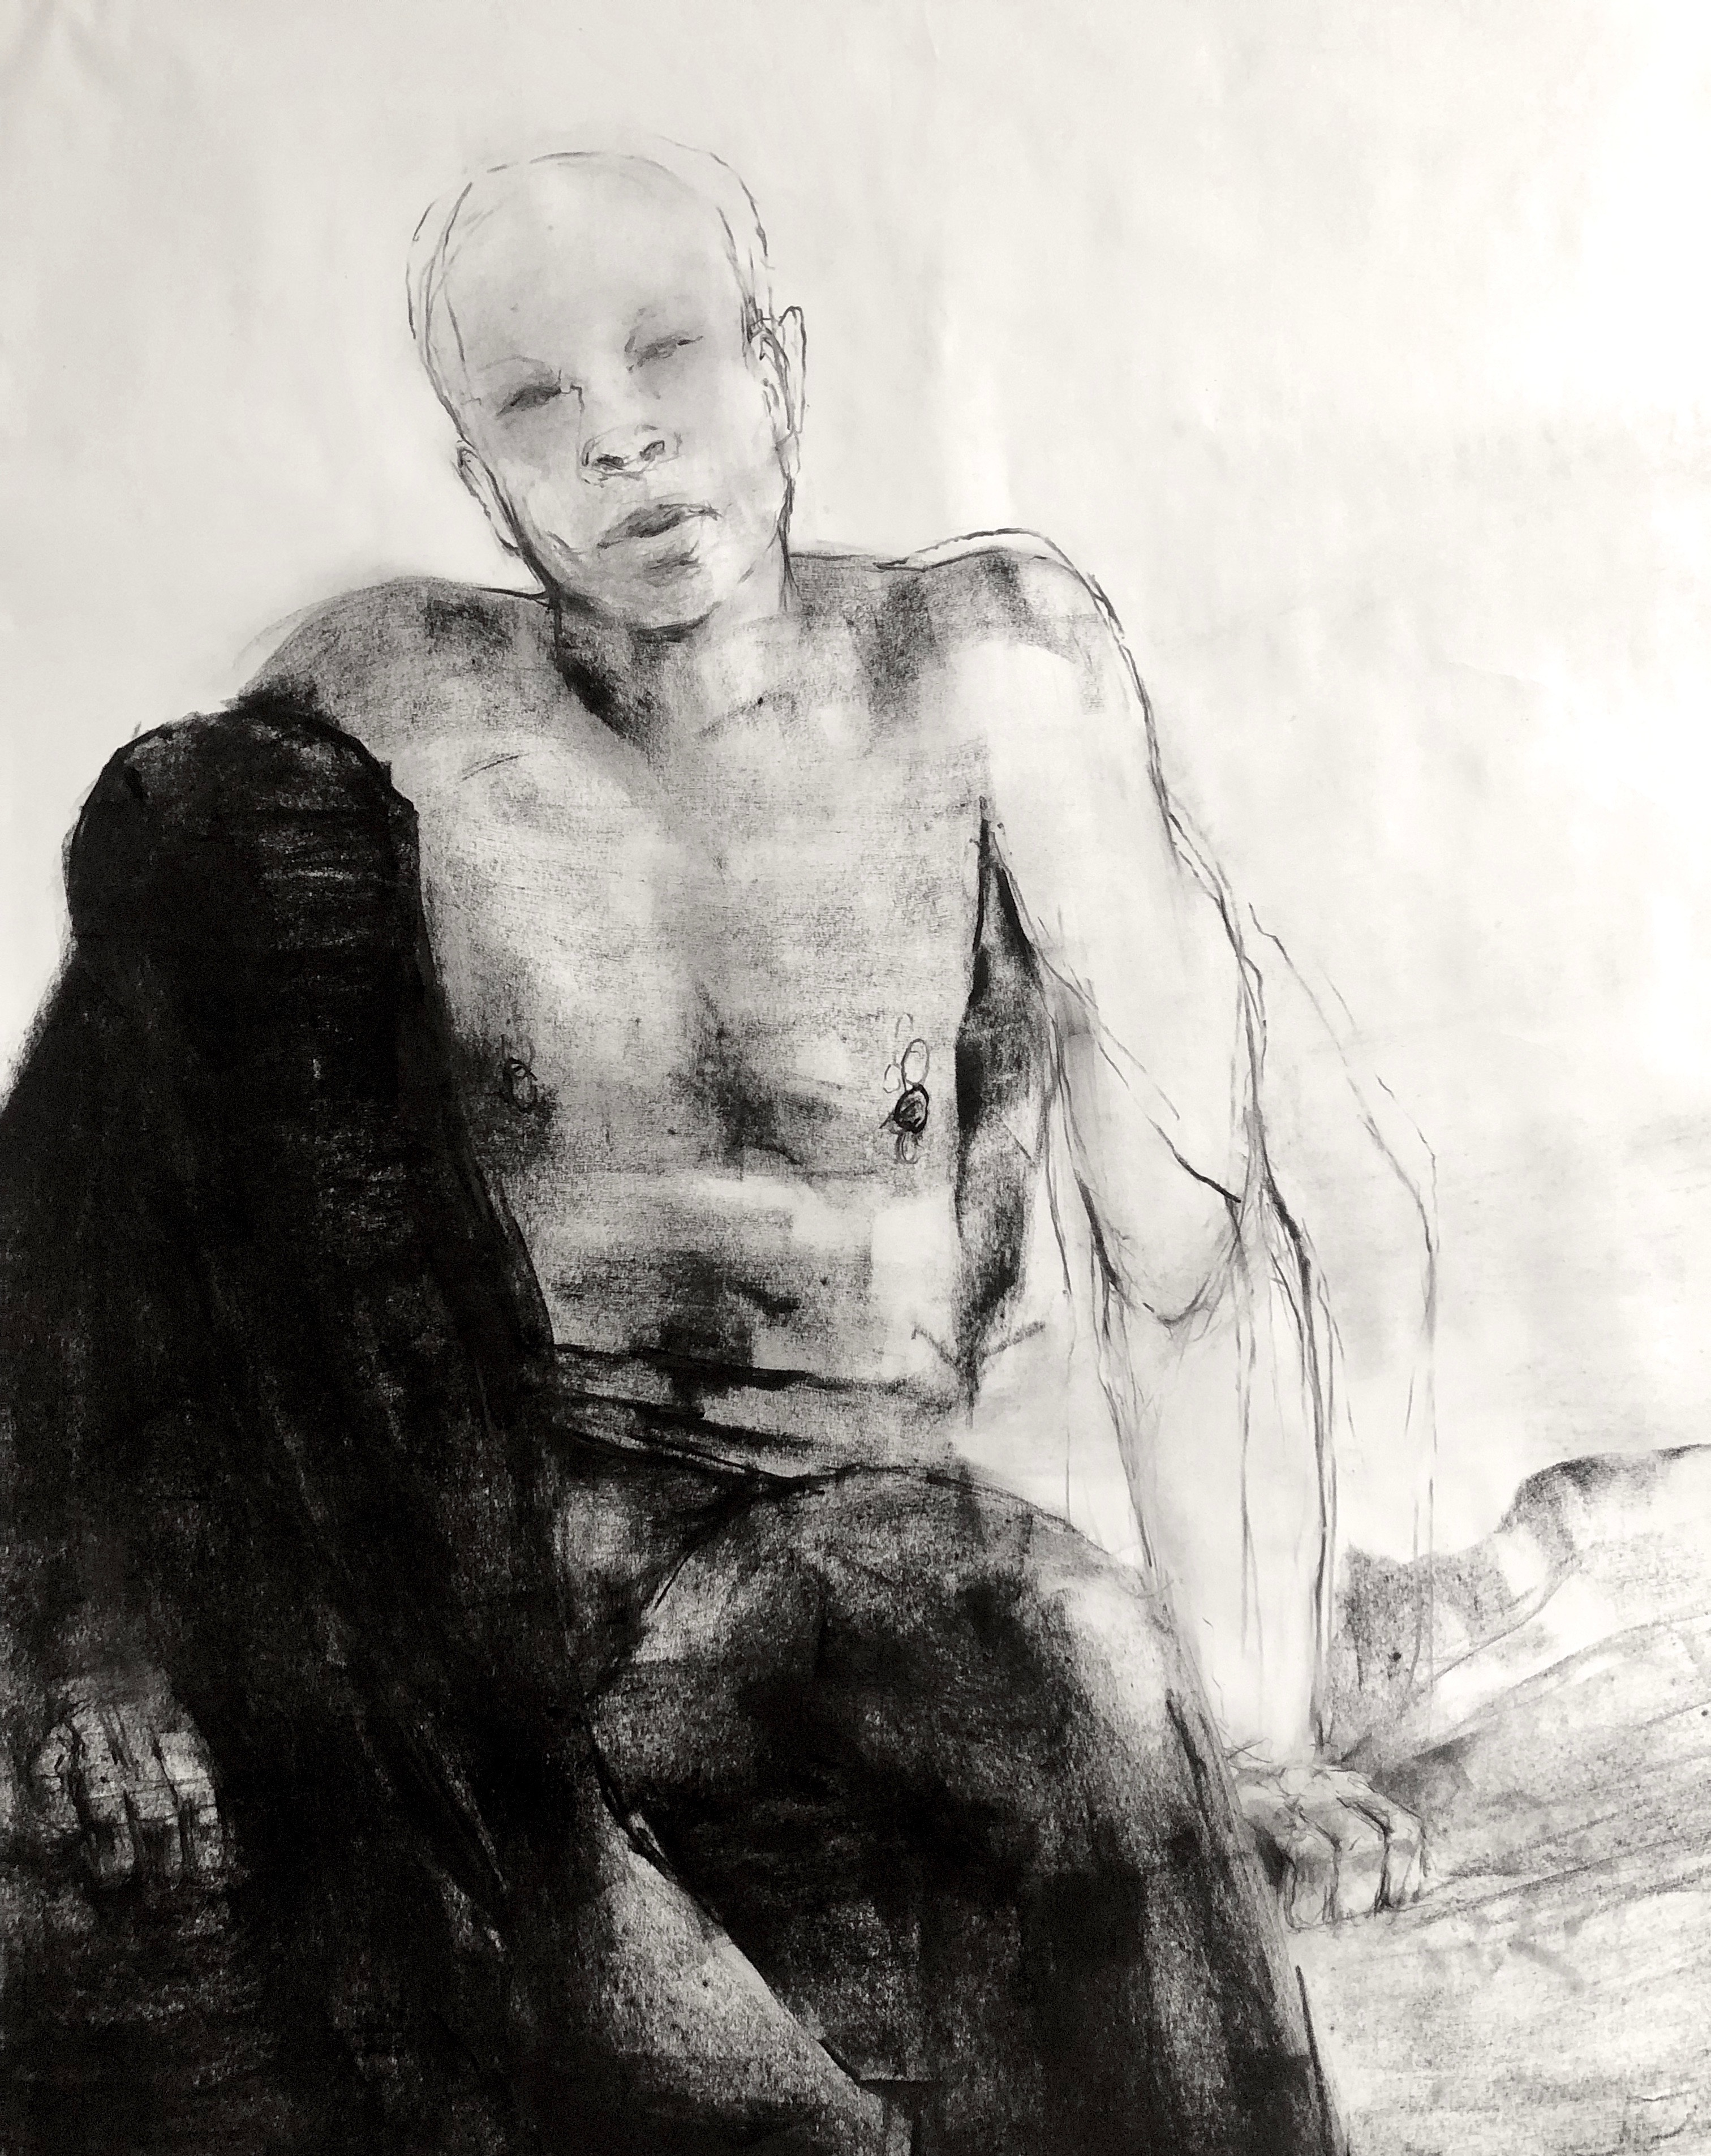 Redbone, John Singletary, 2020, Charcoal and oil on newsprint, 24 x 36